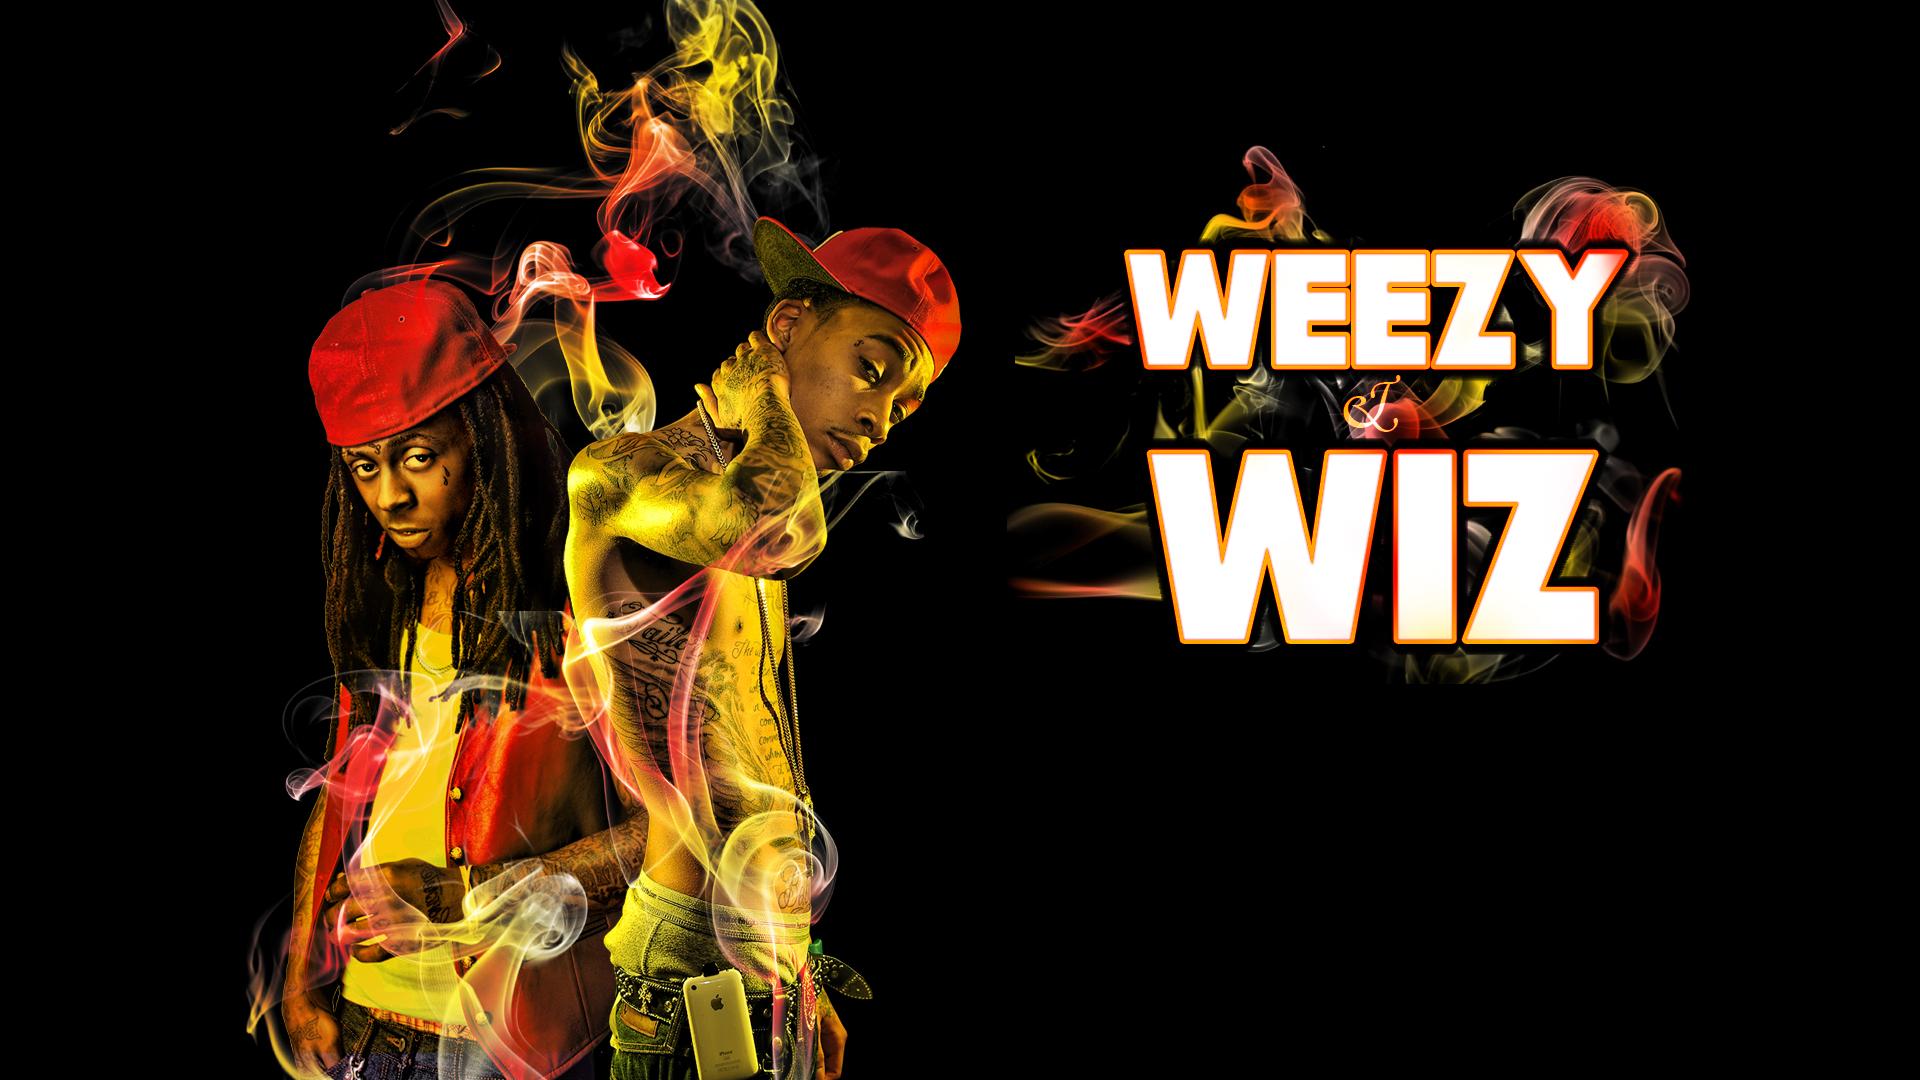 Zombie Lil Wayne Hd